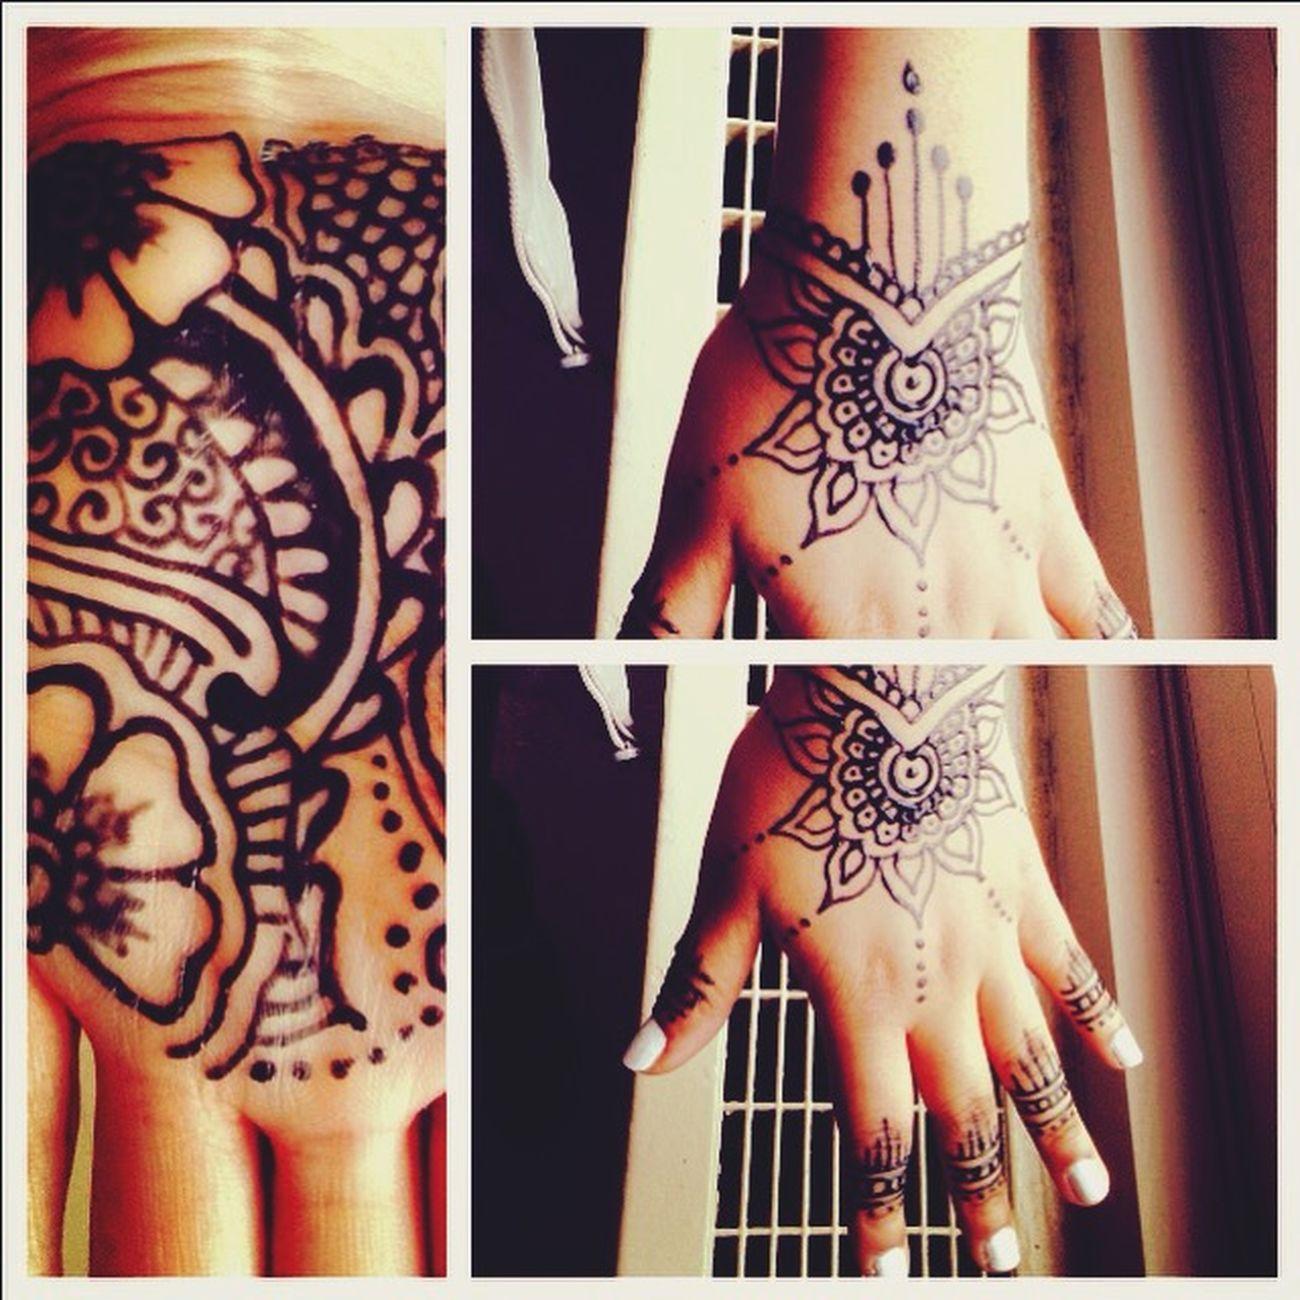 Henna by me Henna Tattoo Design Henna Tatto Art Ink Drawing Tattoo